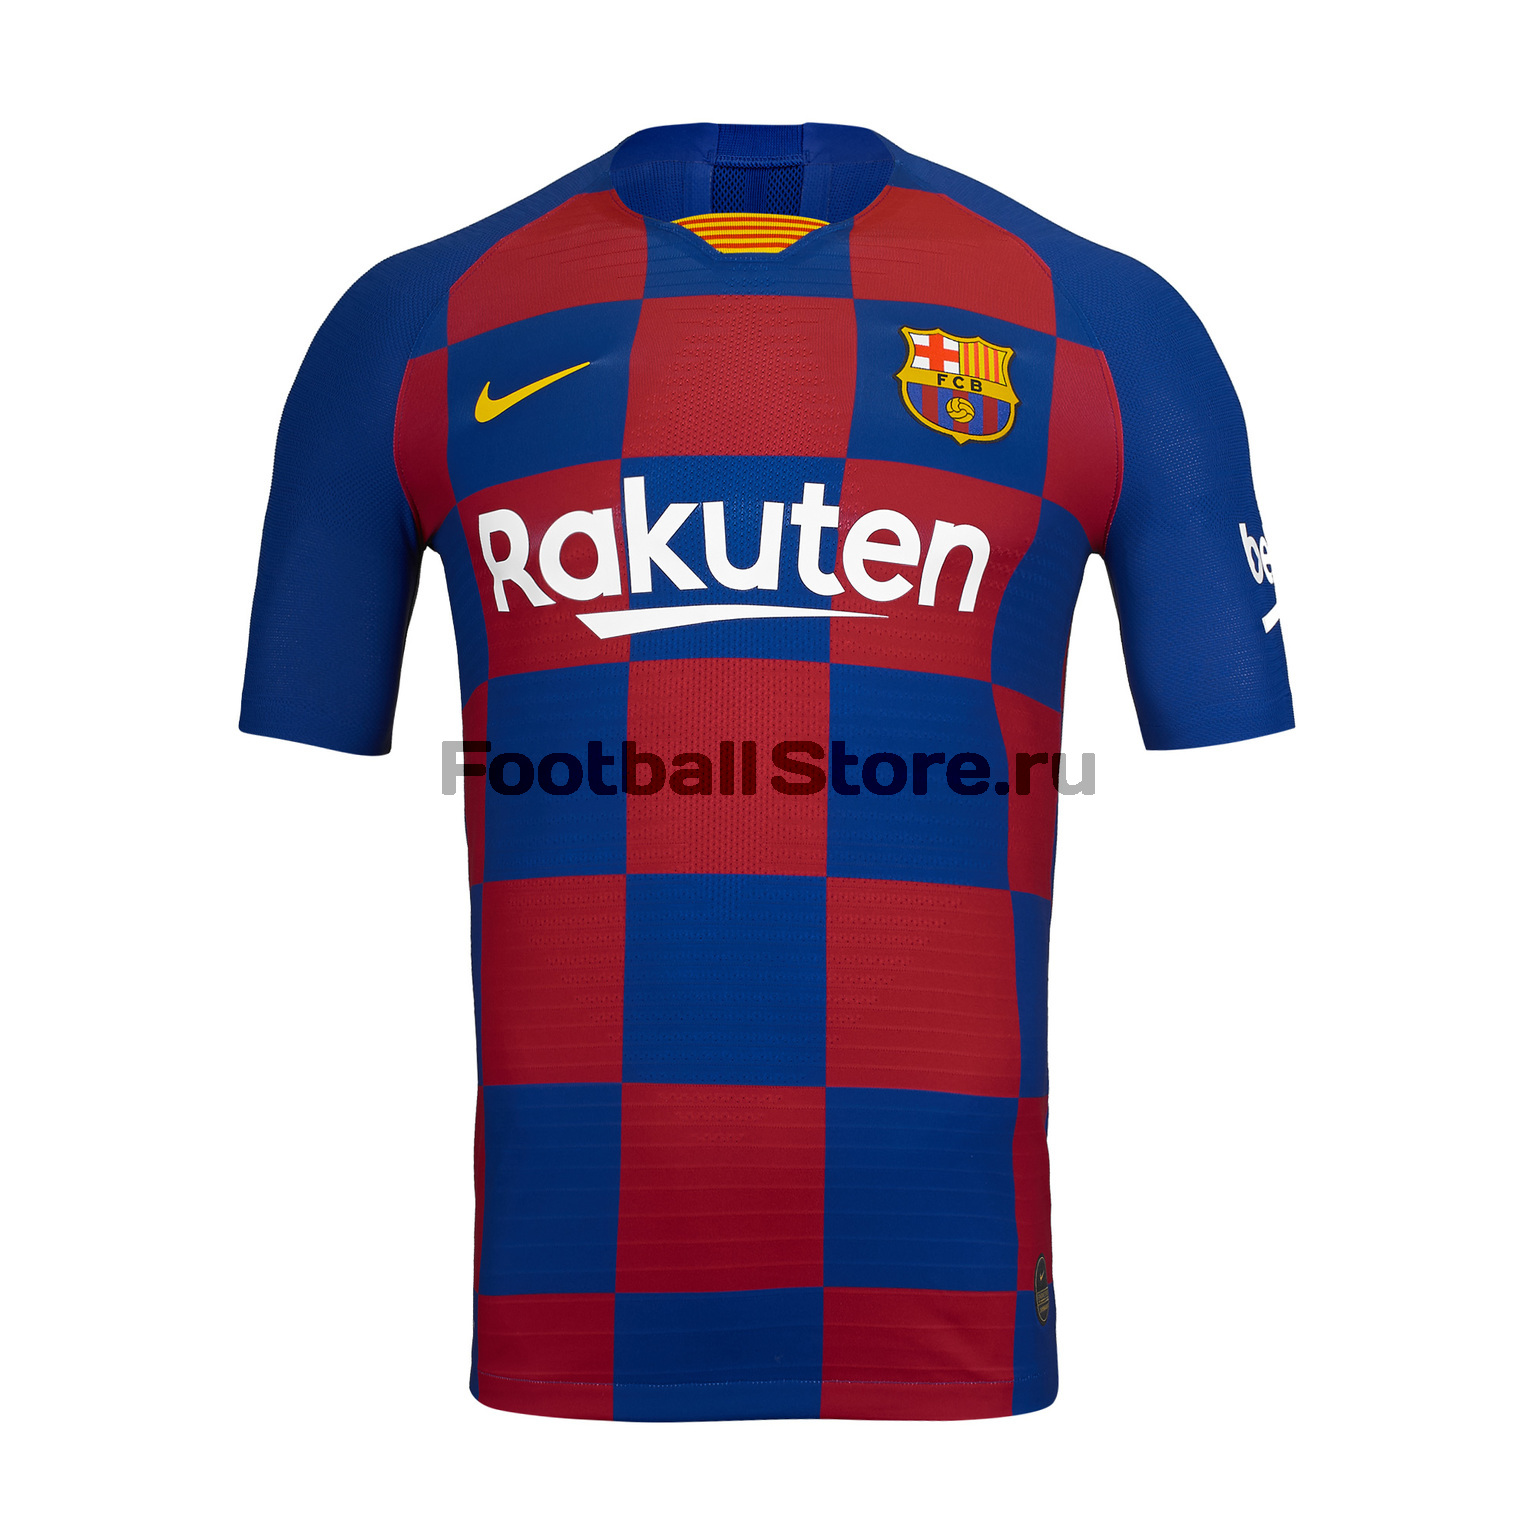 Оригинальная домашняя футболка Nike Barcelona 2019/20